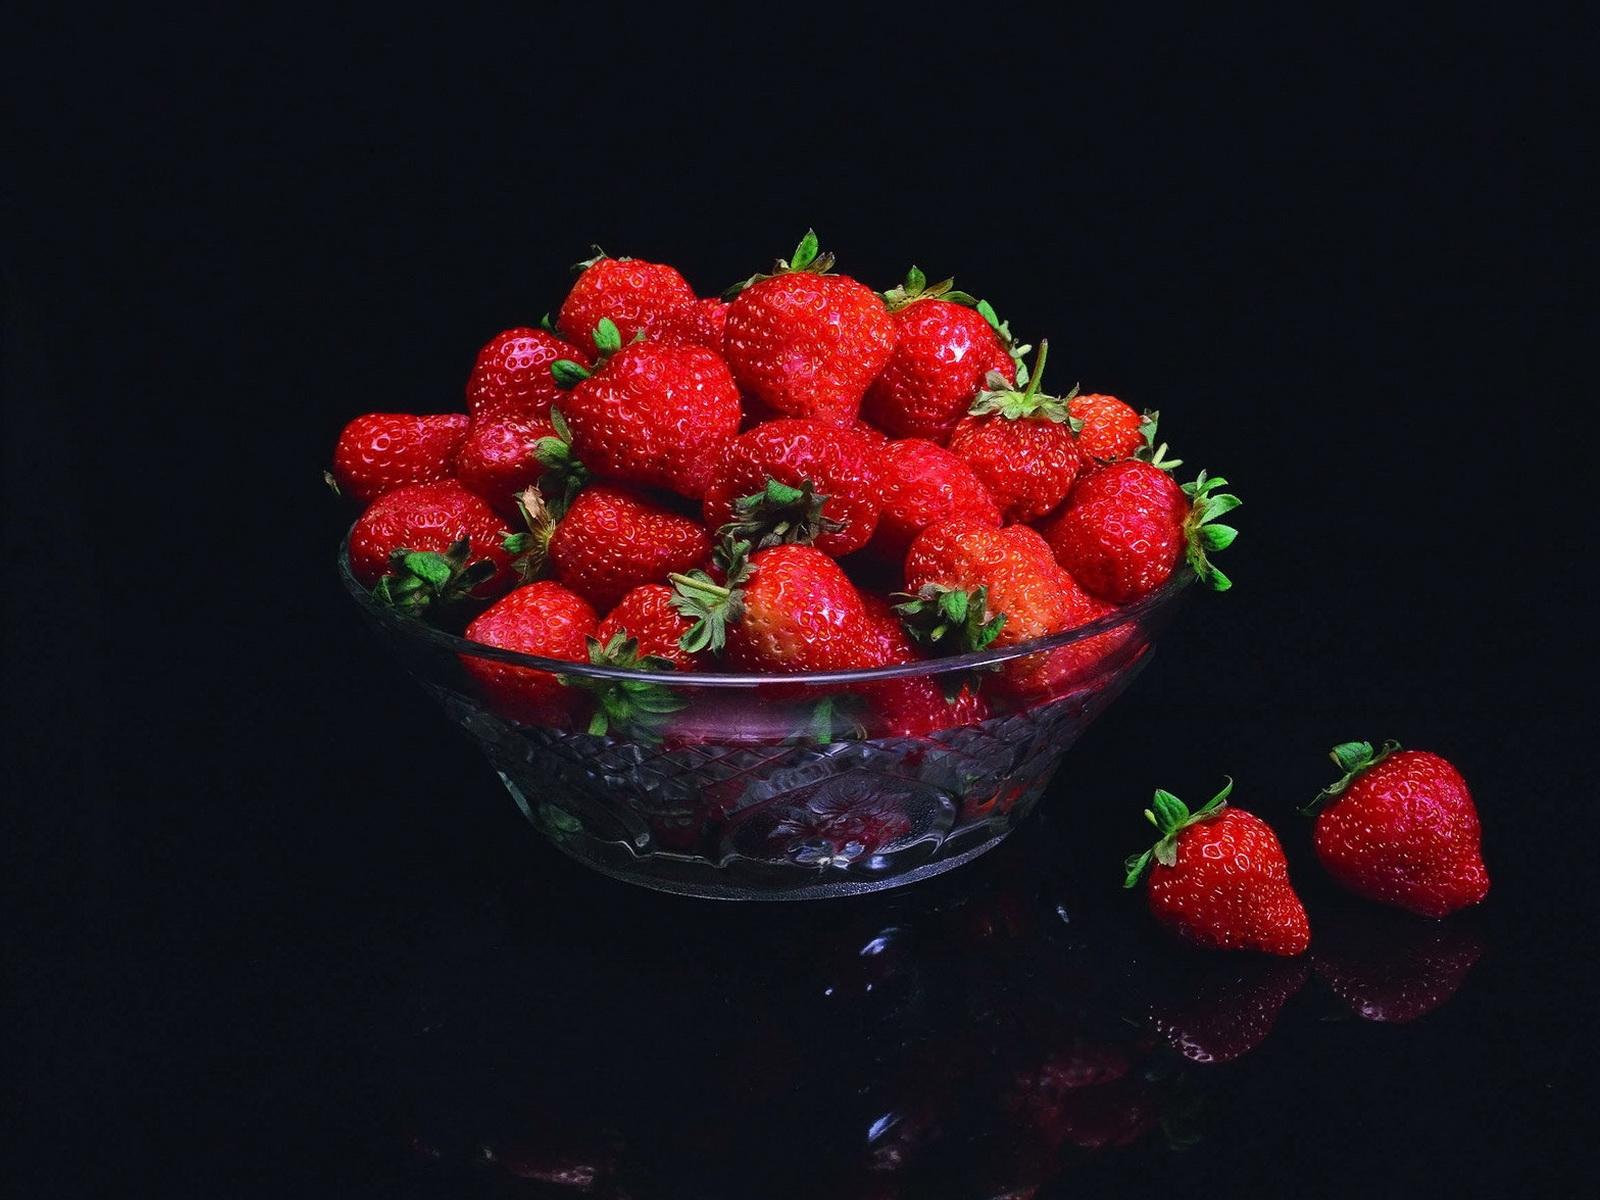 Food Red Fruit Strawberries Glass Flower Plant Berry Bowl Strawberry Raspberry Petal Produce Frutti Di Bosco